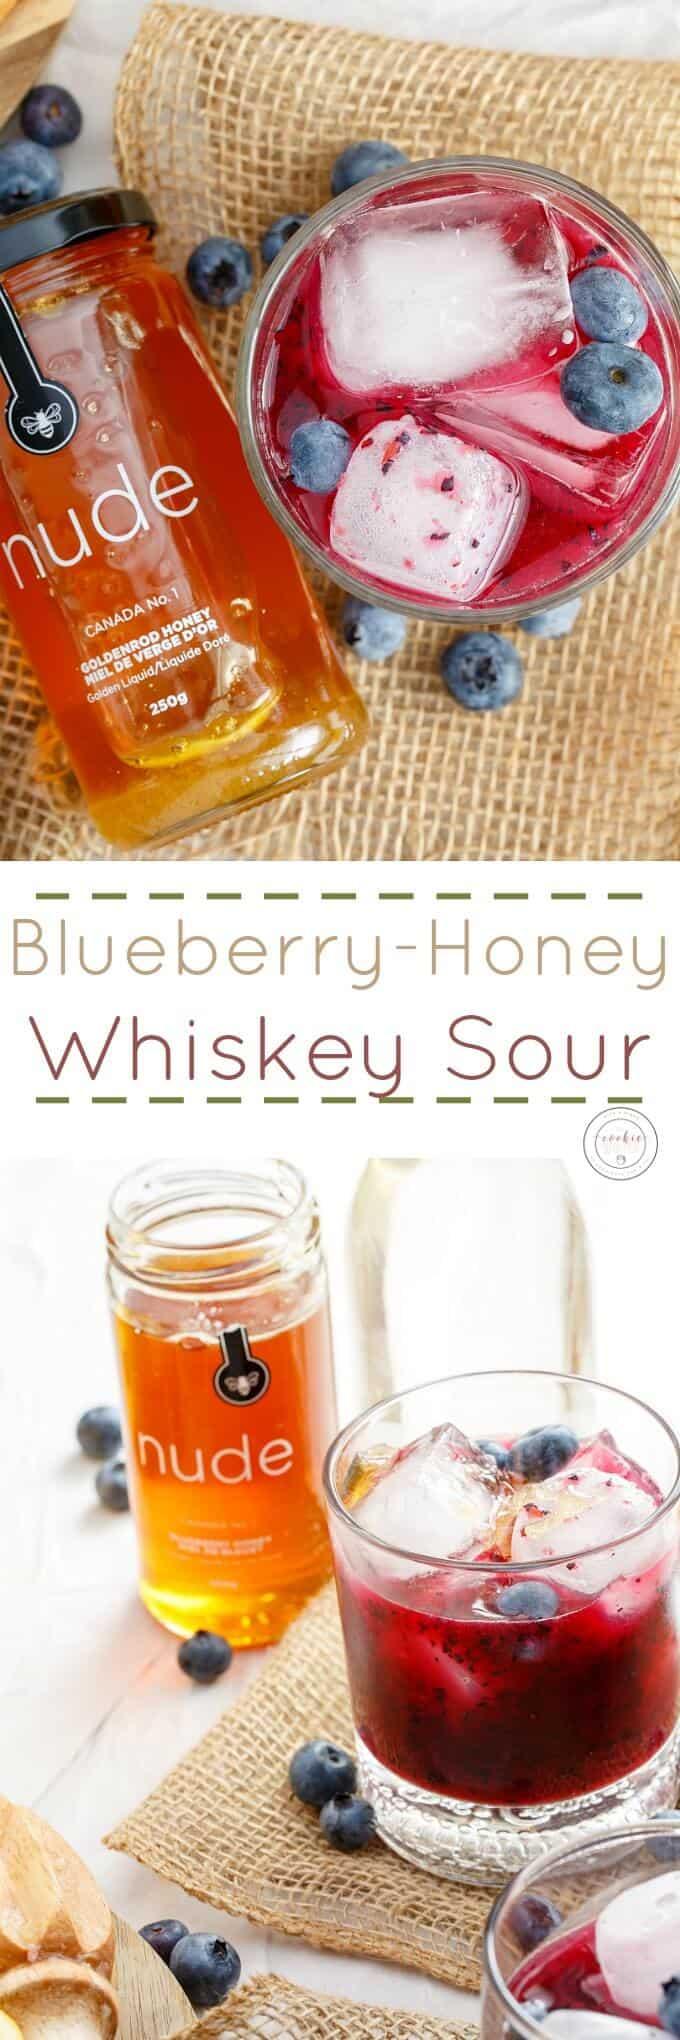 Blueberry-Honey Whiskey Sour